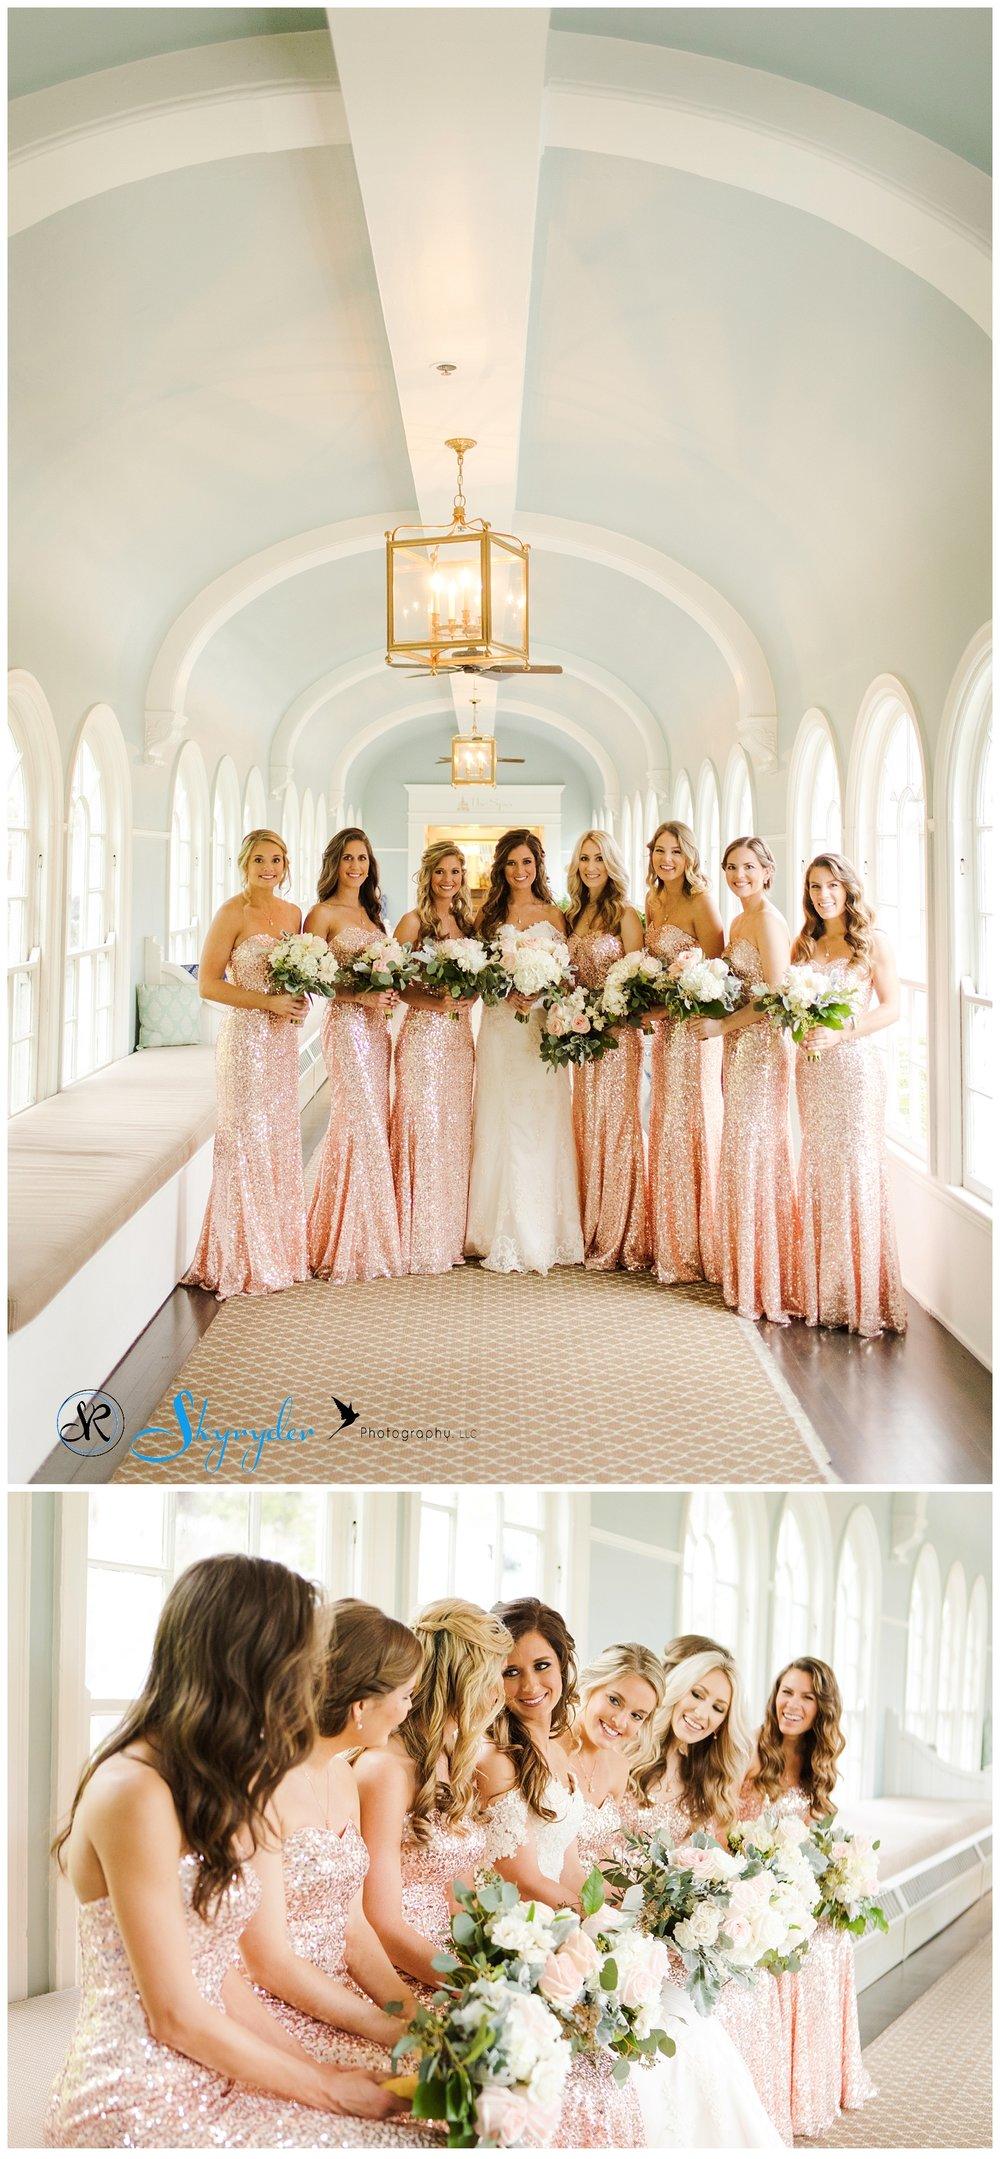 the-omni-homestead-resort-wedding-photographer-photography-hot-springs-virginia-skyryder-blacksburg-engagement-roanoke-charlottesville-radford-lexington_0017 (1).jpg